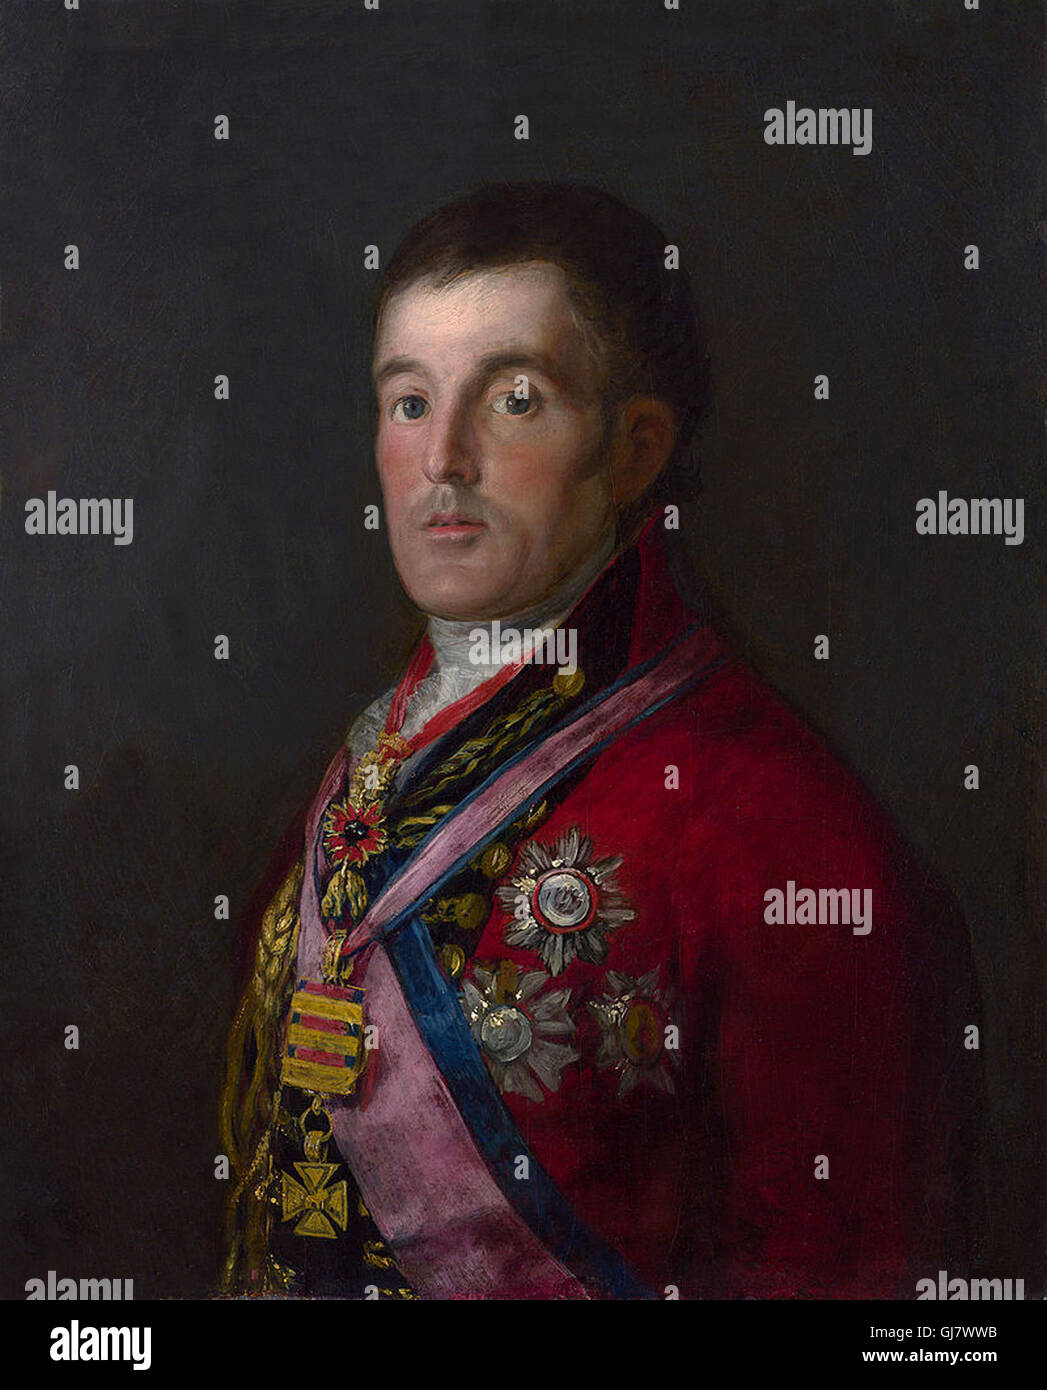 Field Marshal Arthur Wellesley the 1st Duke of Wellington wearing field marshal's uniform. Portrait by Francisco - Stock Image